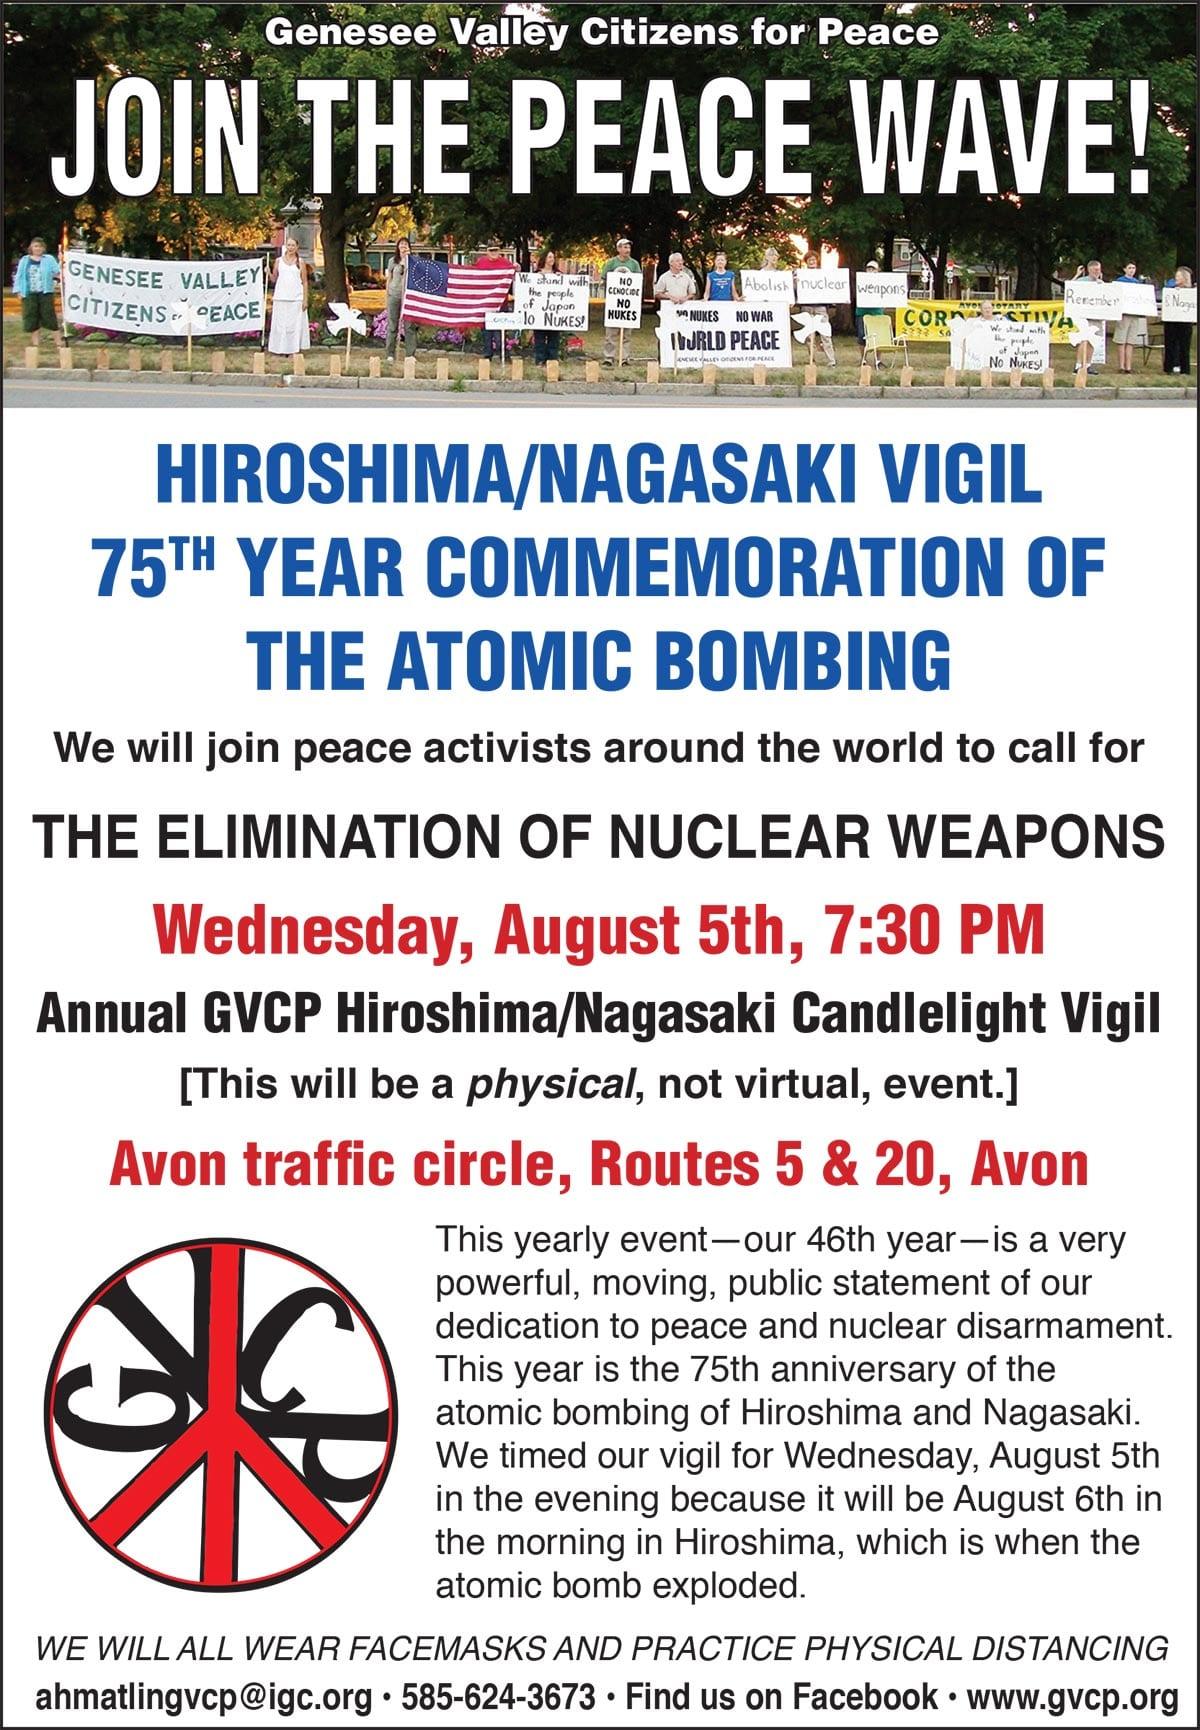 GVCP LCN Ad about Hiroshima and Nagasaki remembrance vigil